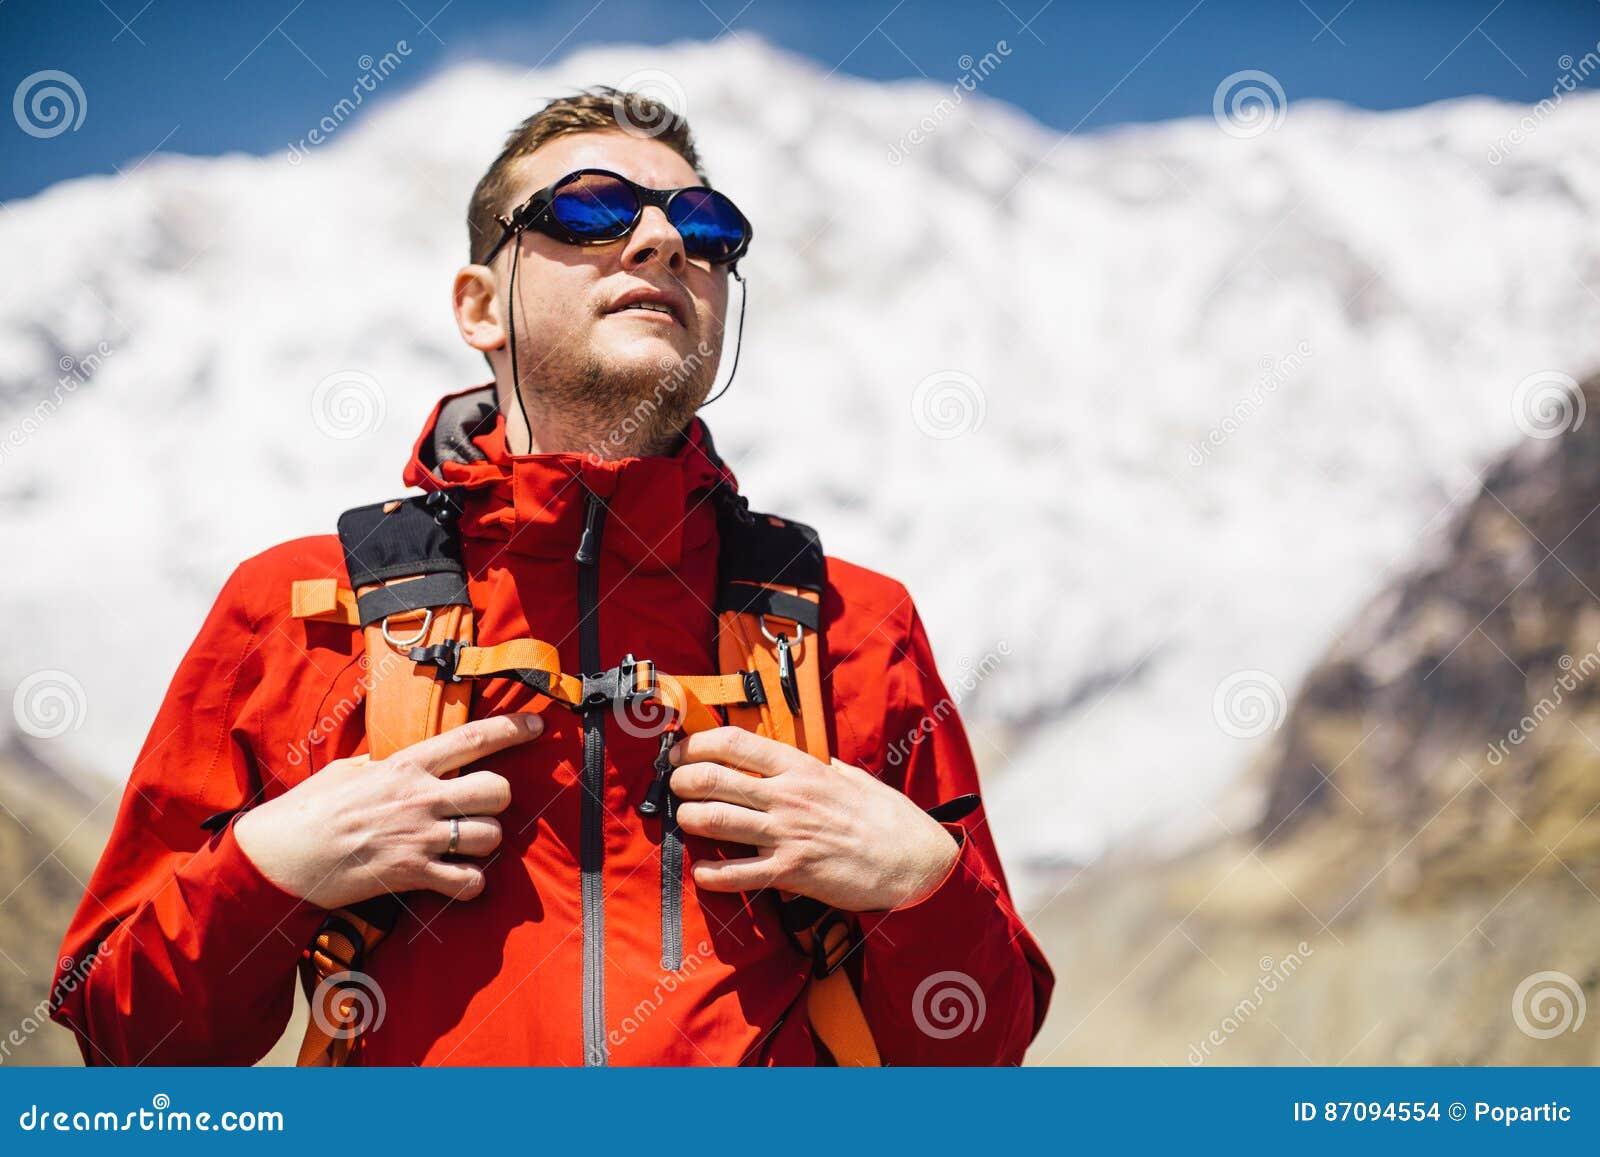 15759b11212 Οδοιπόρος με το σακίδιο πλάτης που εξετάζει τη σύνοδο κορυφής Στοκ ...